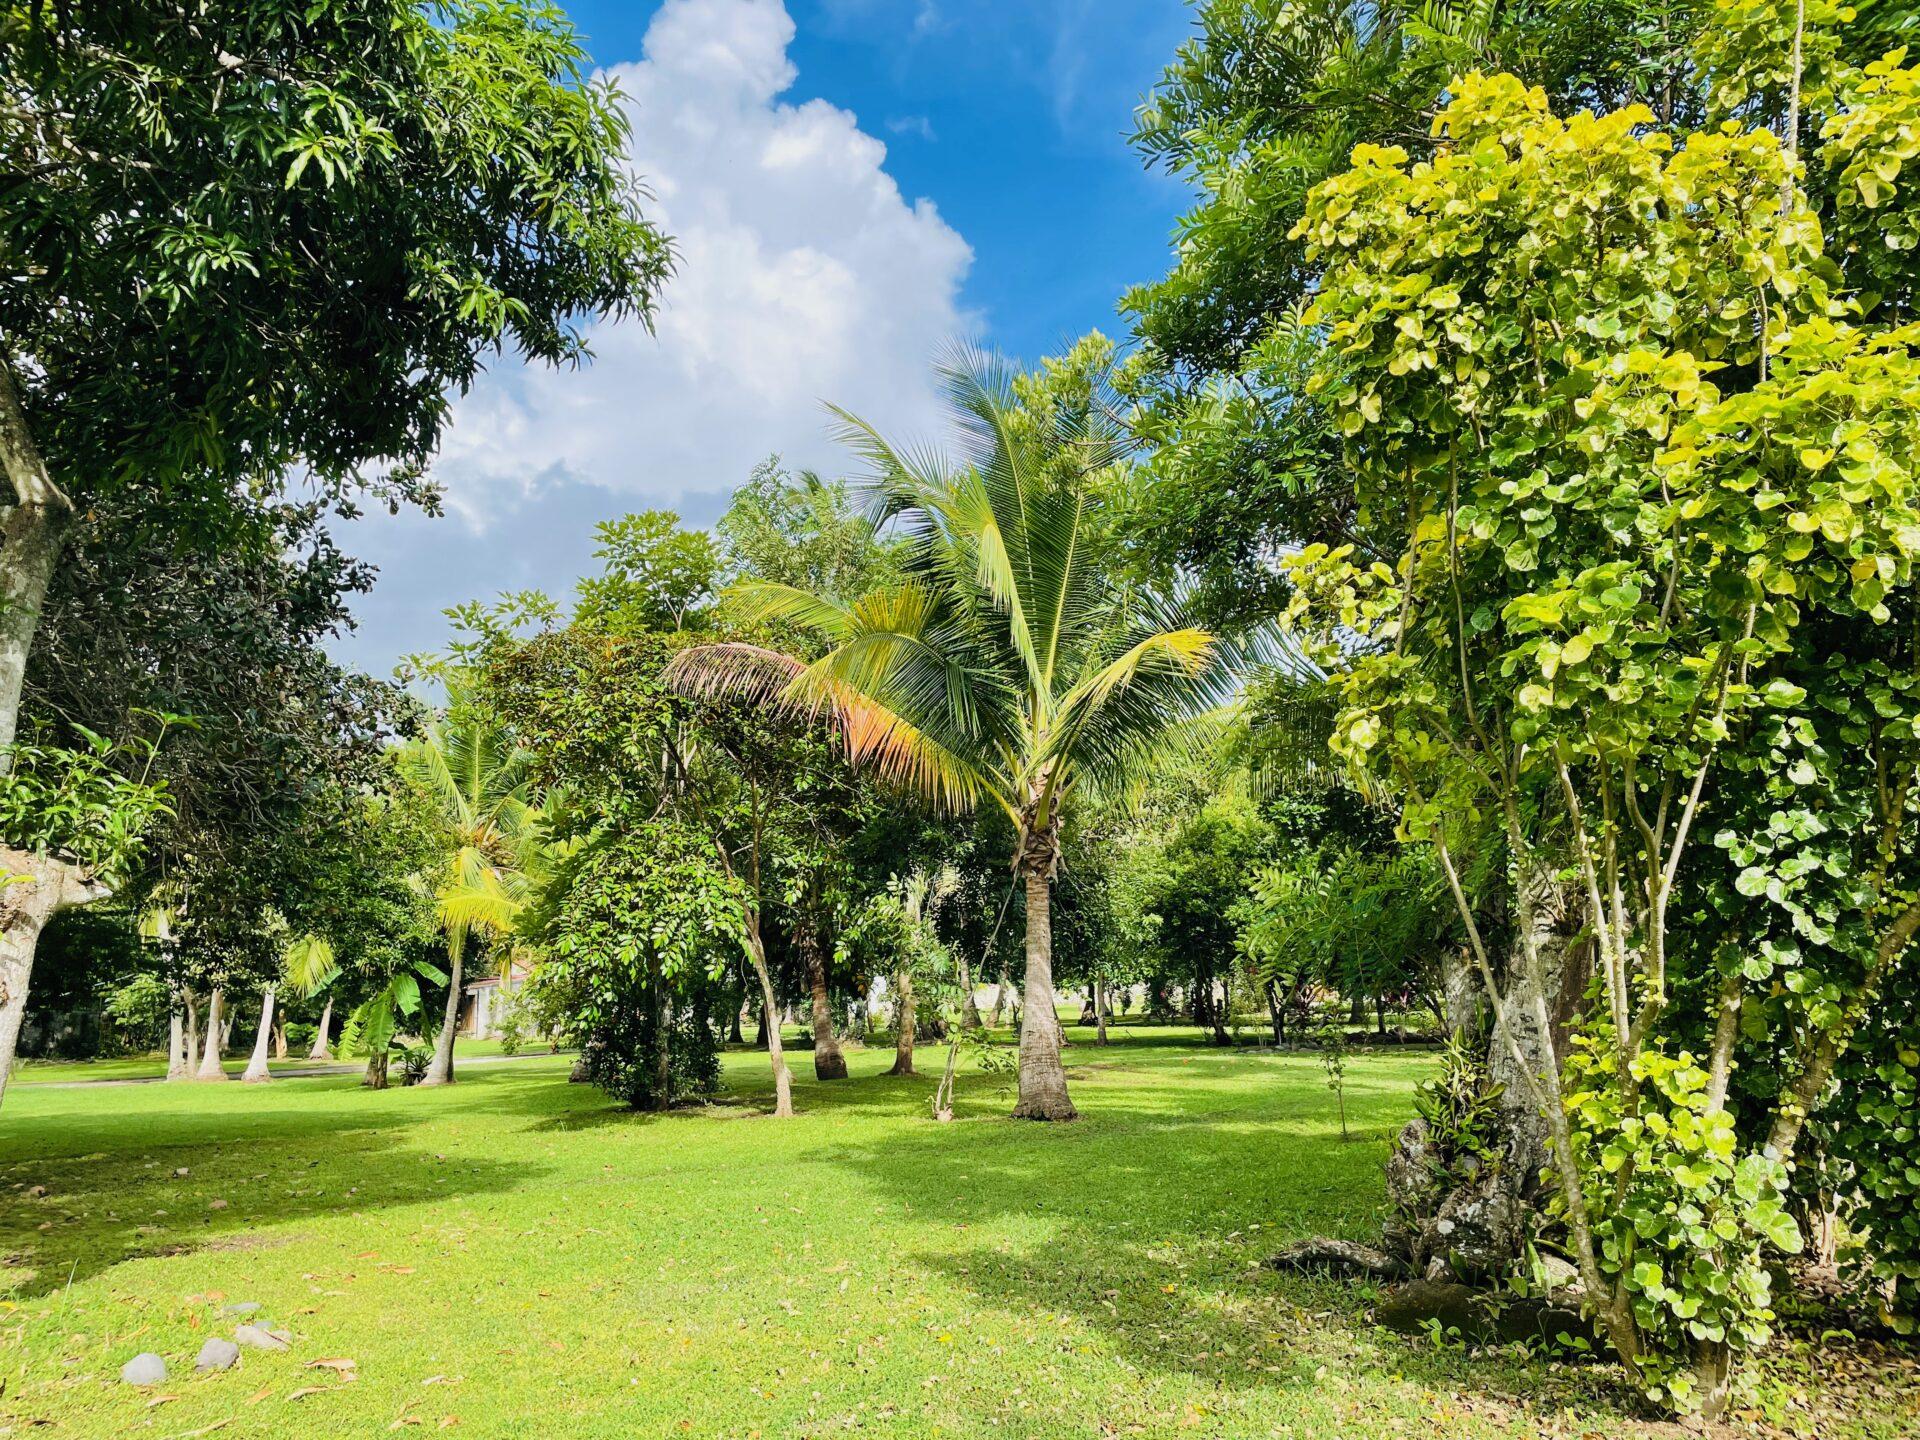 boca-barranca-grounds